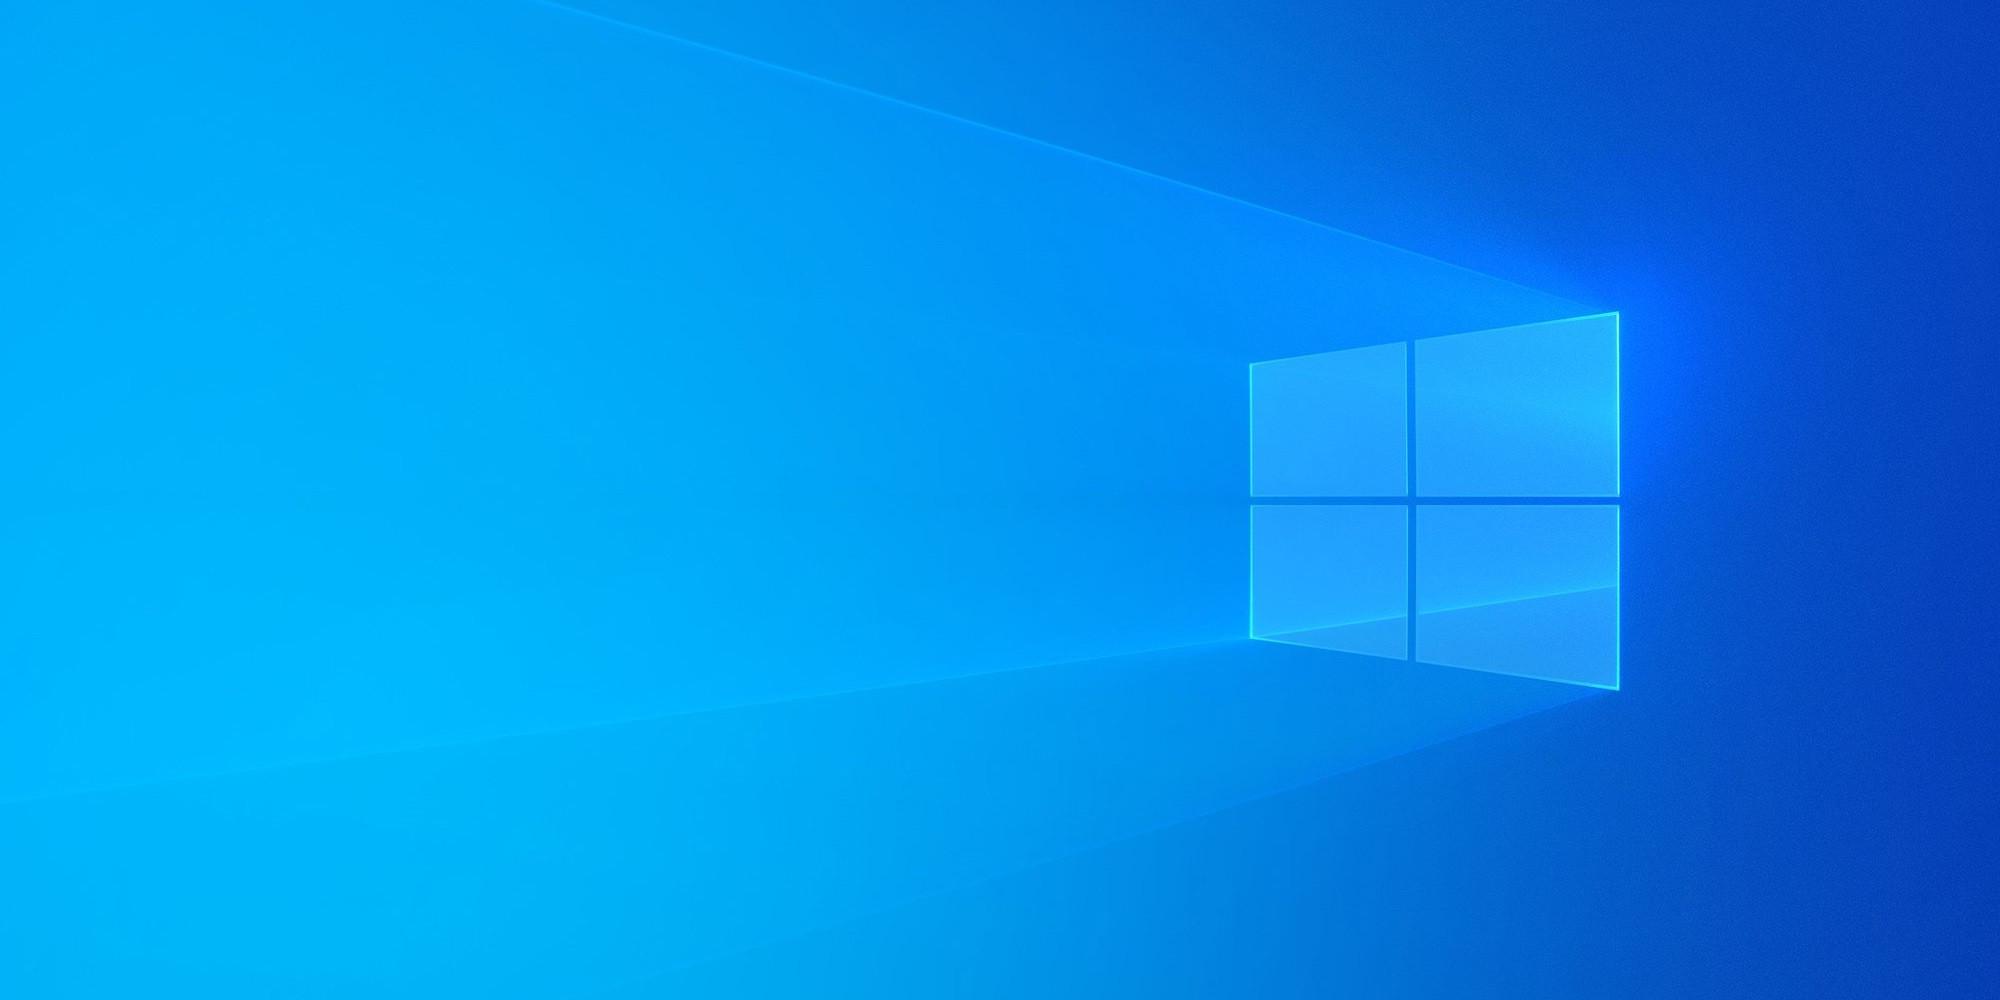 How to remove Windows 10 login password